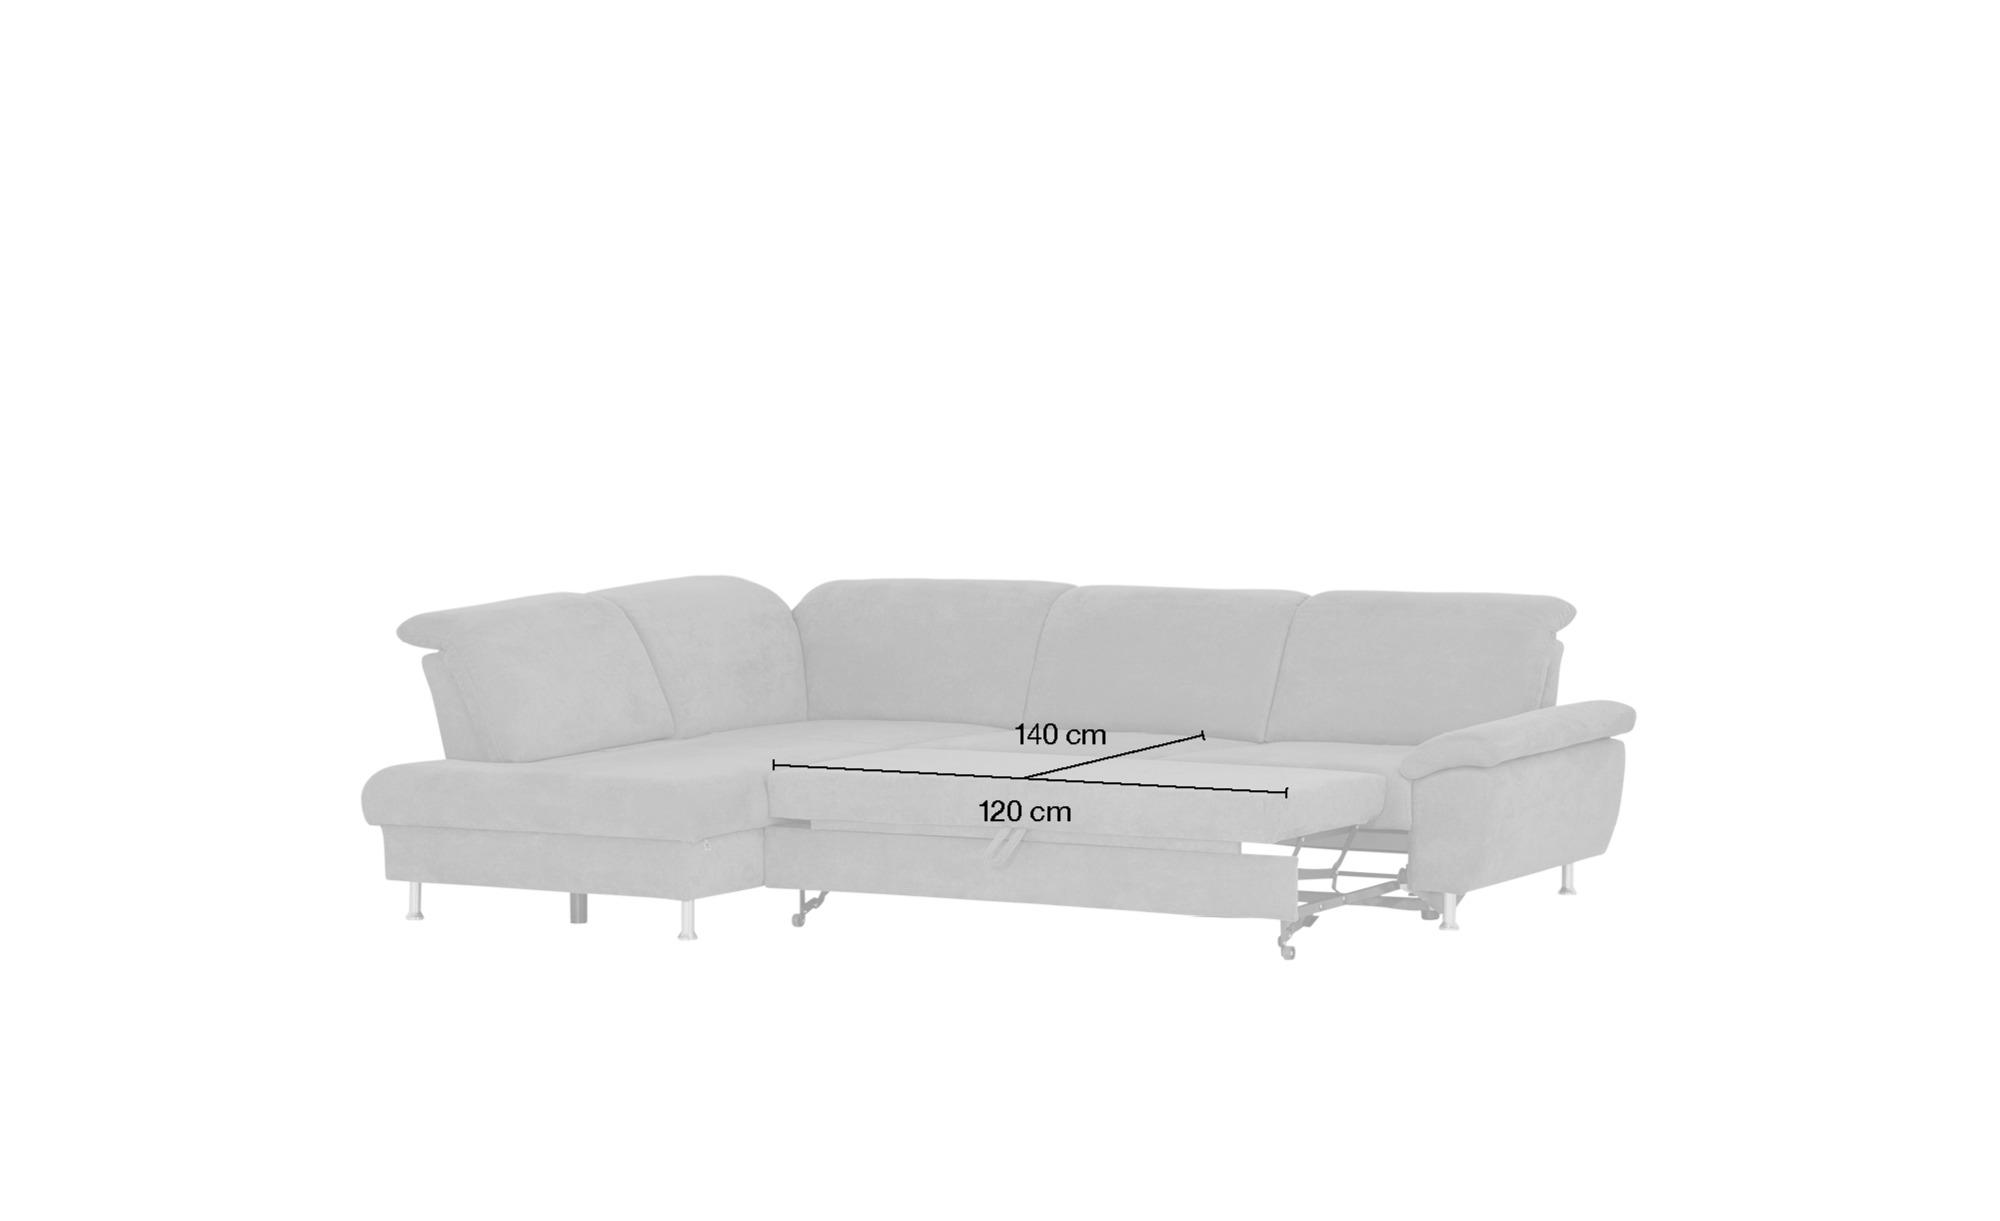 Diva Ecksofa  Diva Lounge ¦ grau Polstermöbel > Sofas > Ecksofas - Höffner